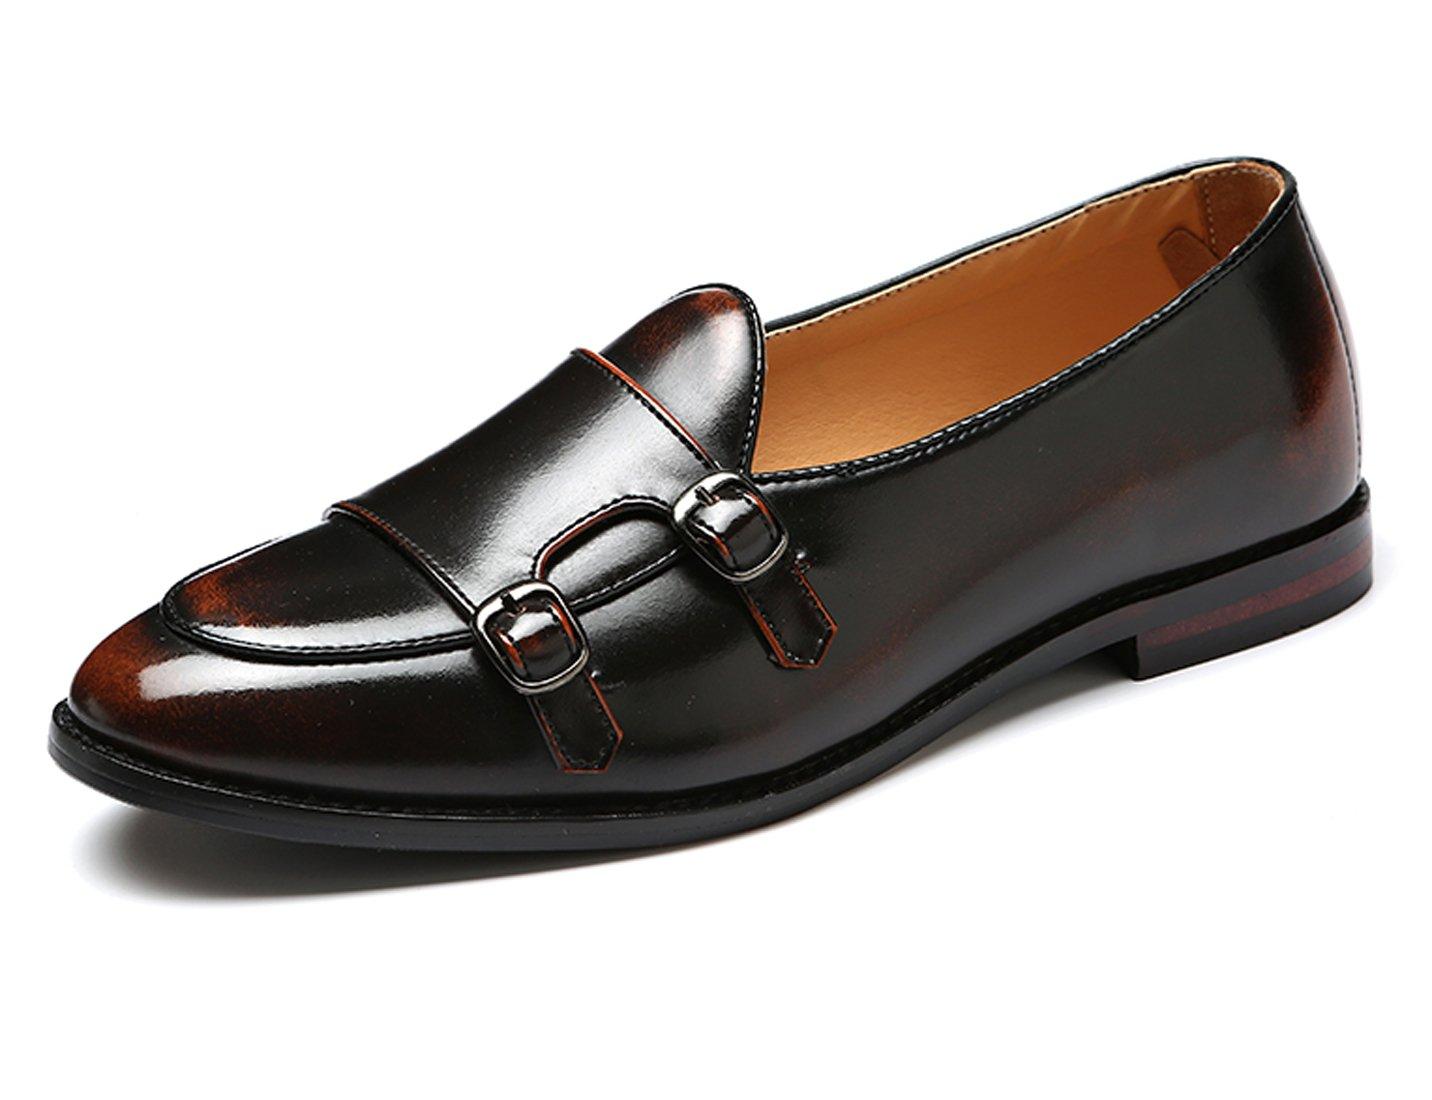 Santimon Italy Luxury Monk Strap Wedding Dress Shoes for Men Leather Handmade Shoes Bronze 8 D(M) US